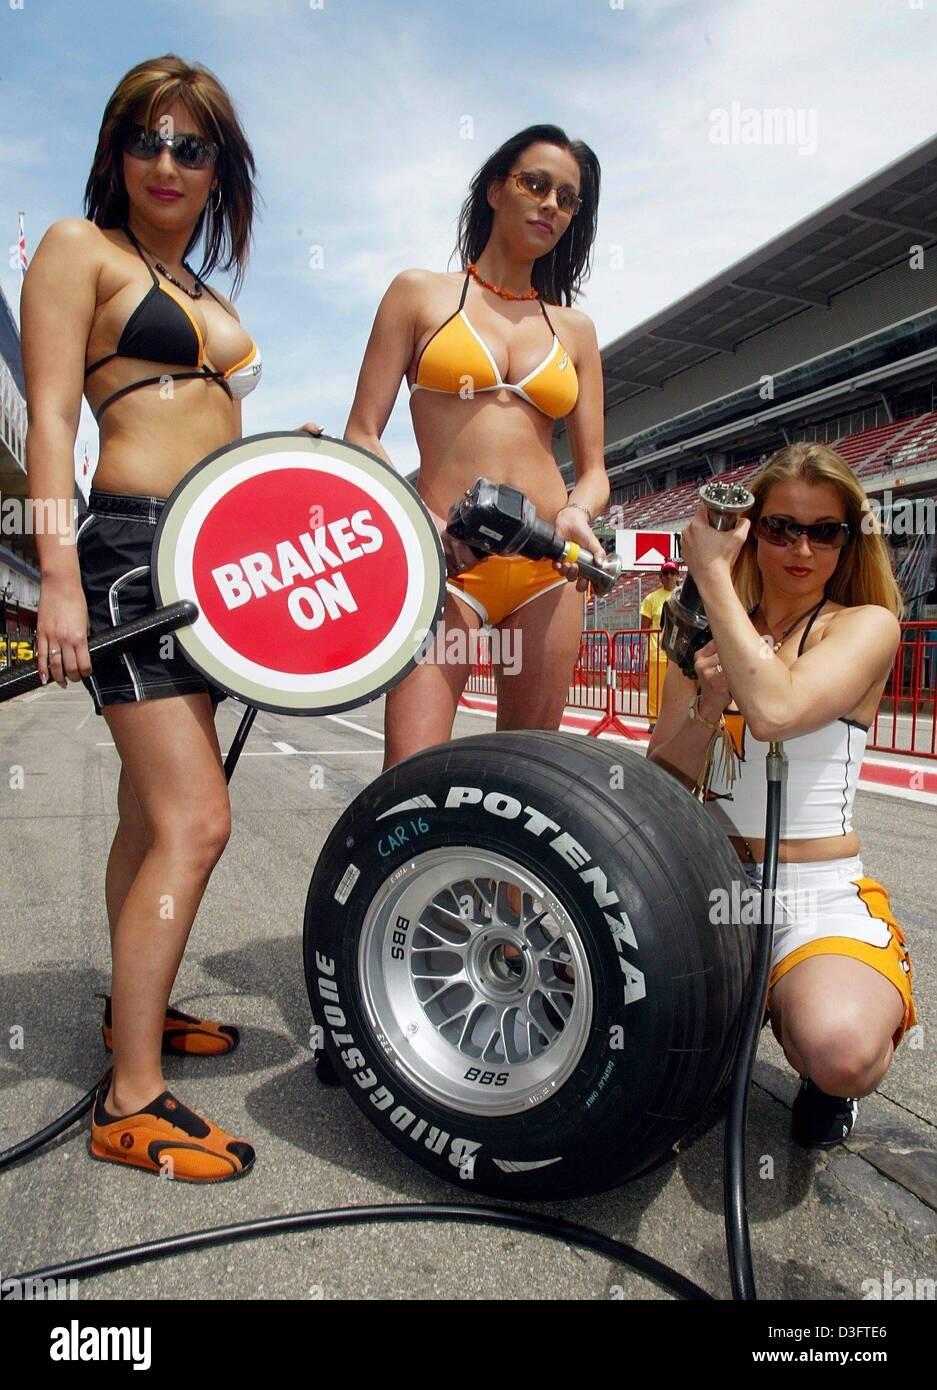 Remarkable, very bbs girls bikini well, not